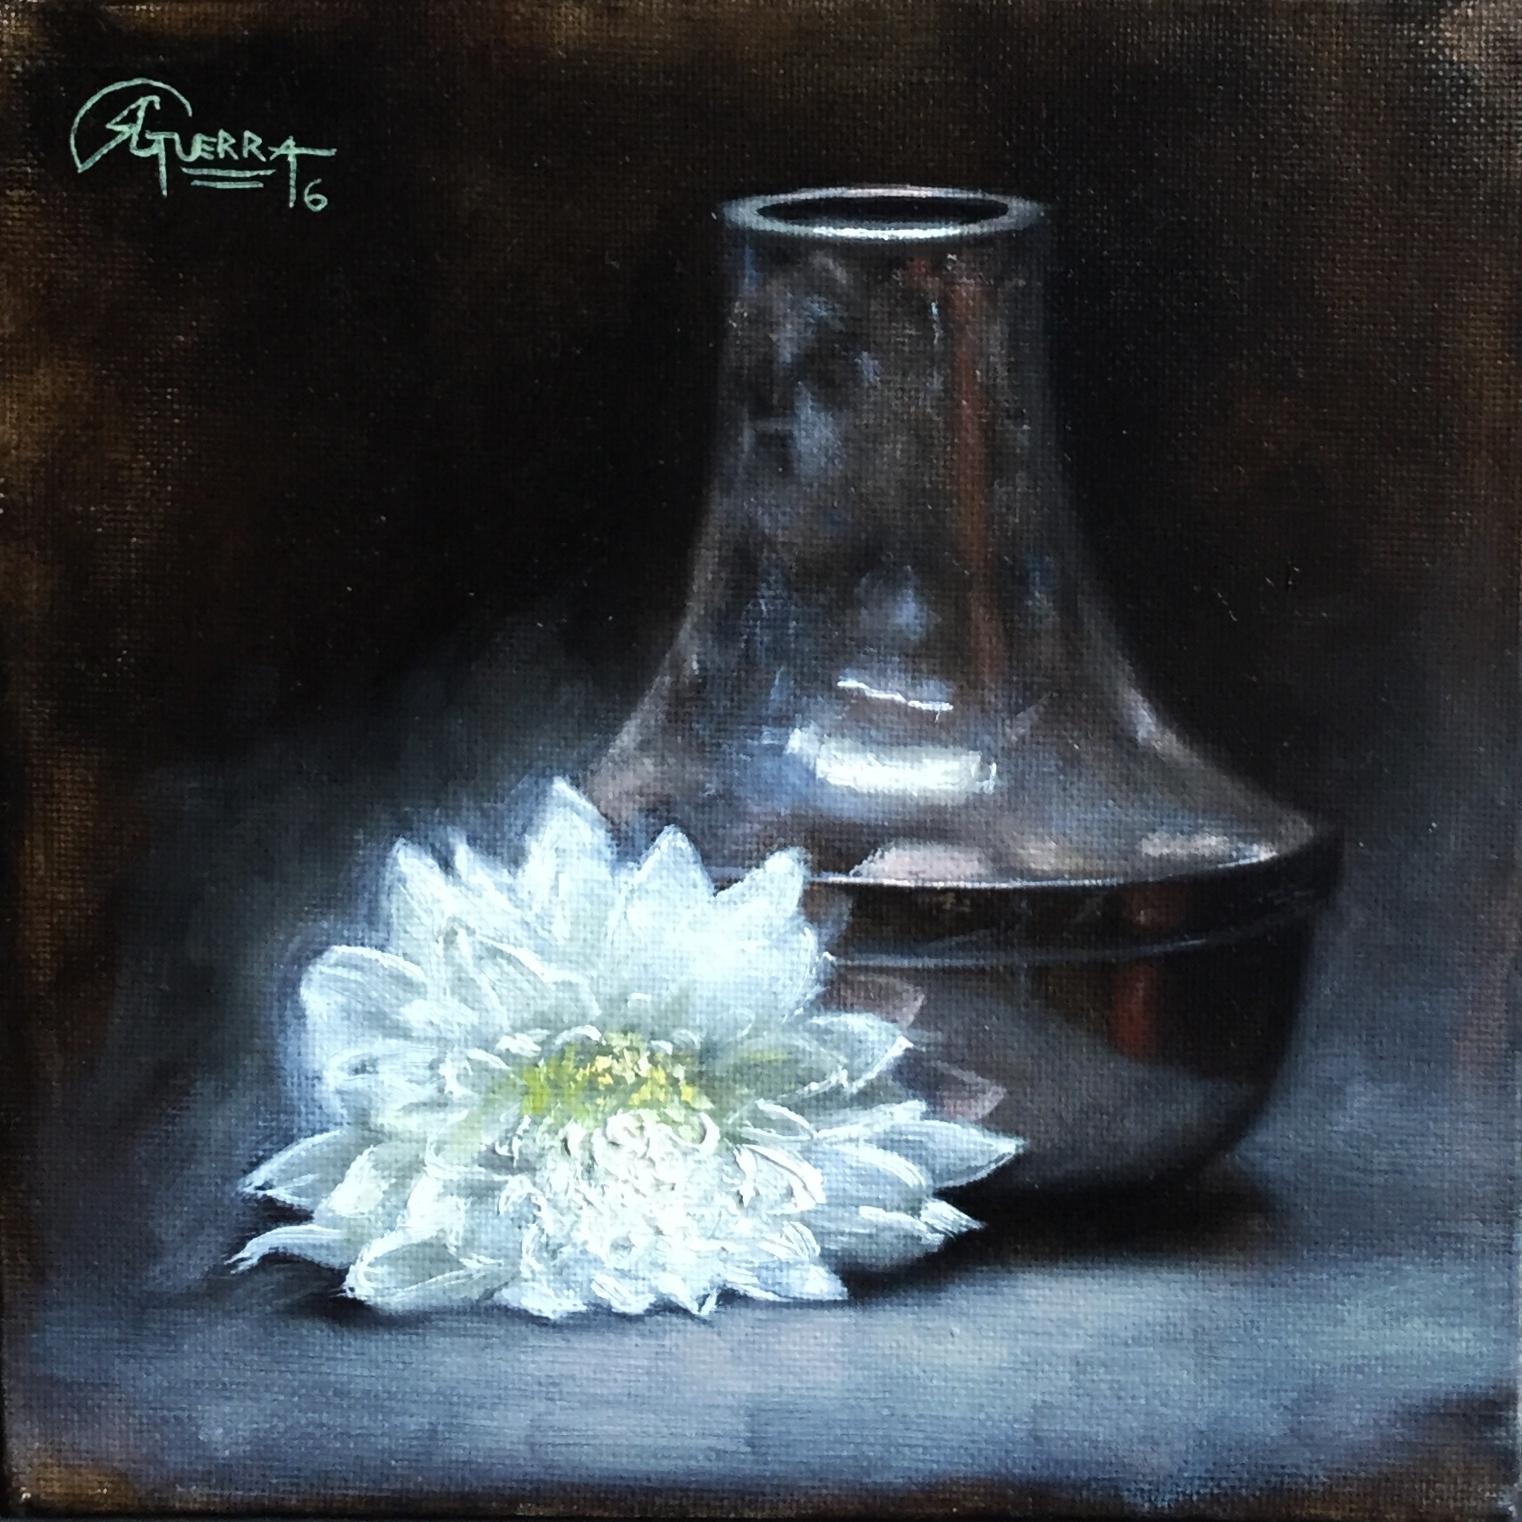 Metal Vase and White Flower